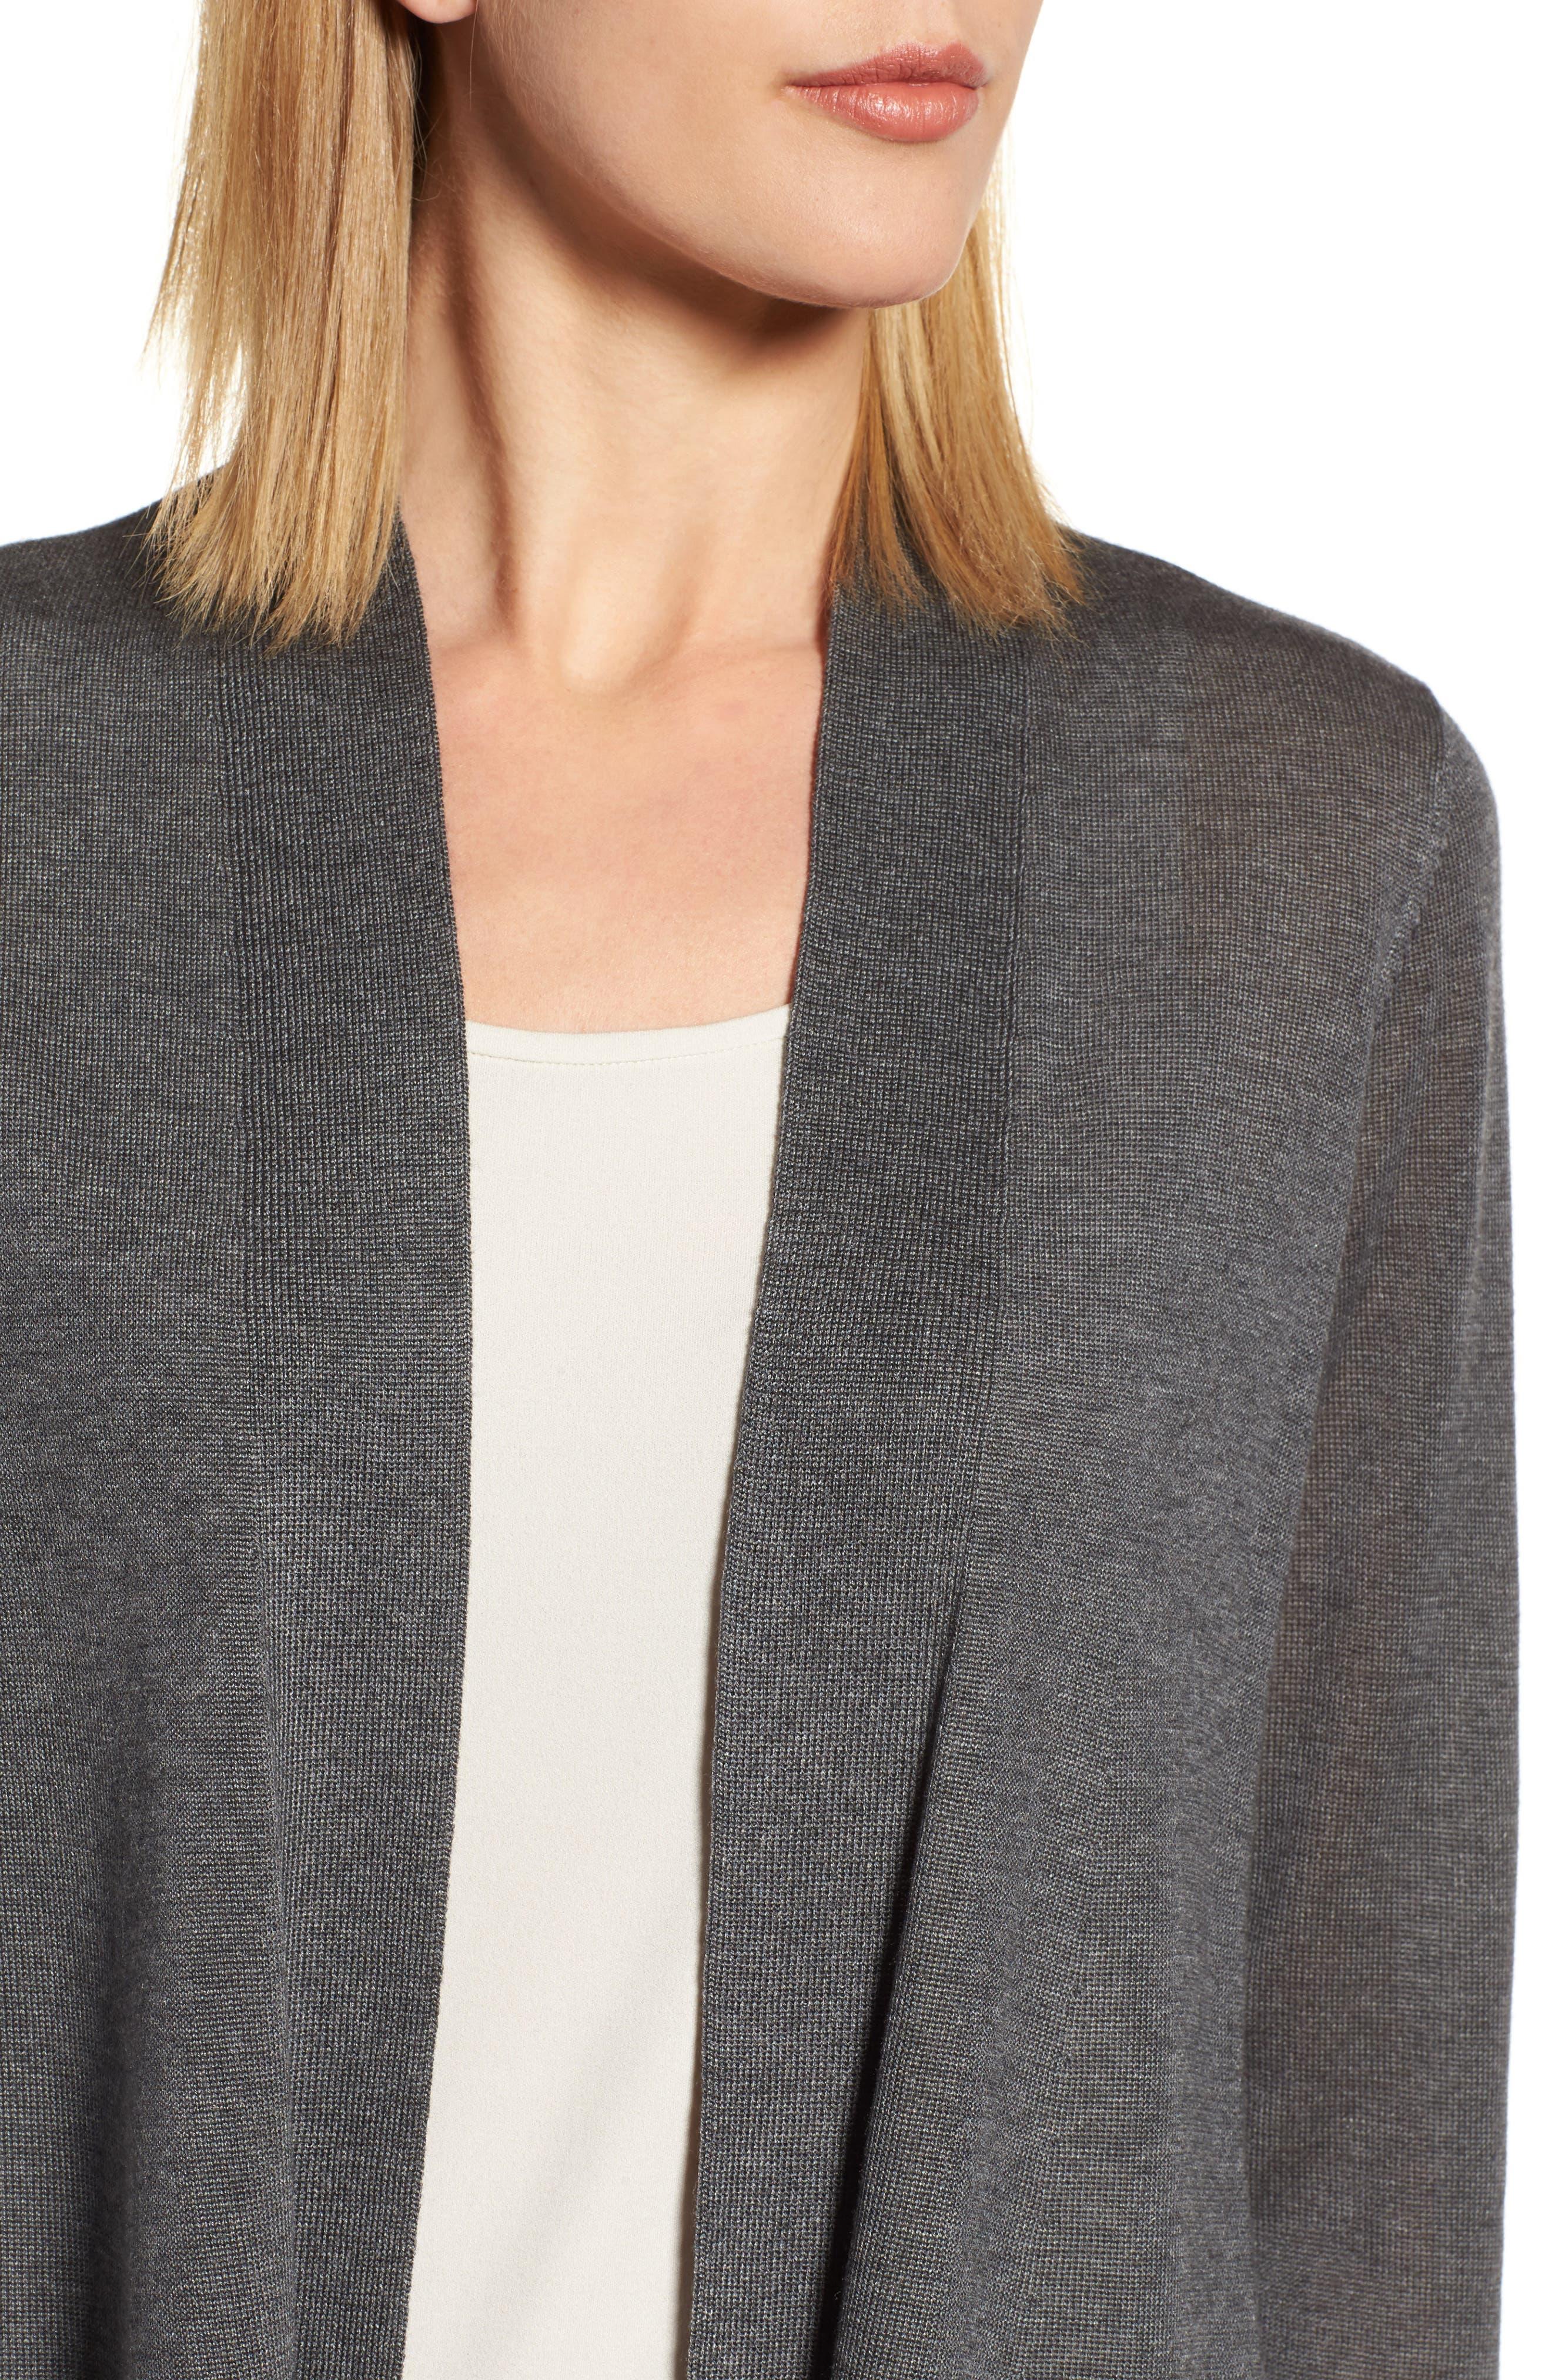 Tencel<sup>®</sup> Lyocell & Merino Wool Shaped Cardigan,                             Alternate thumbnail 4, color,                             030